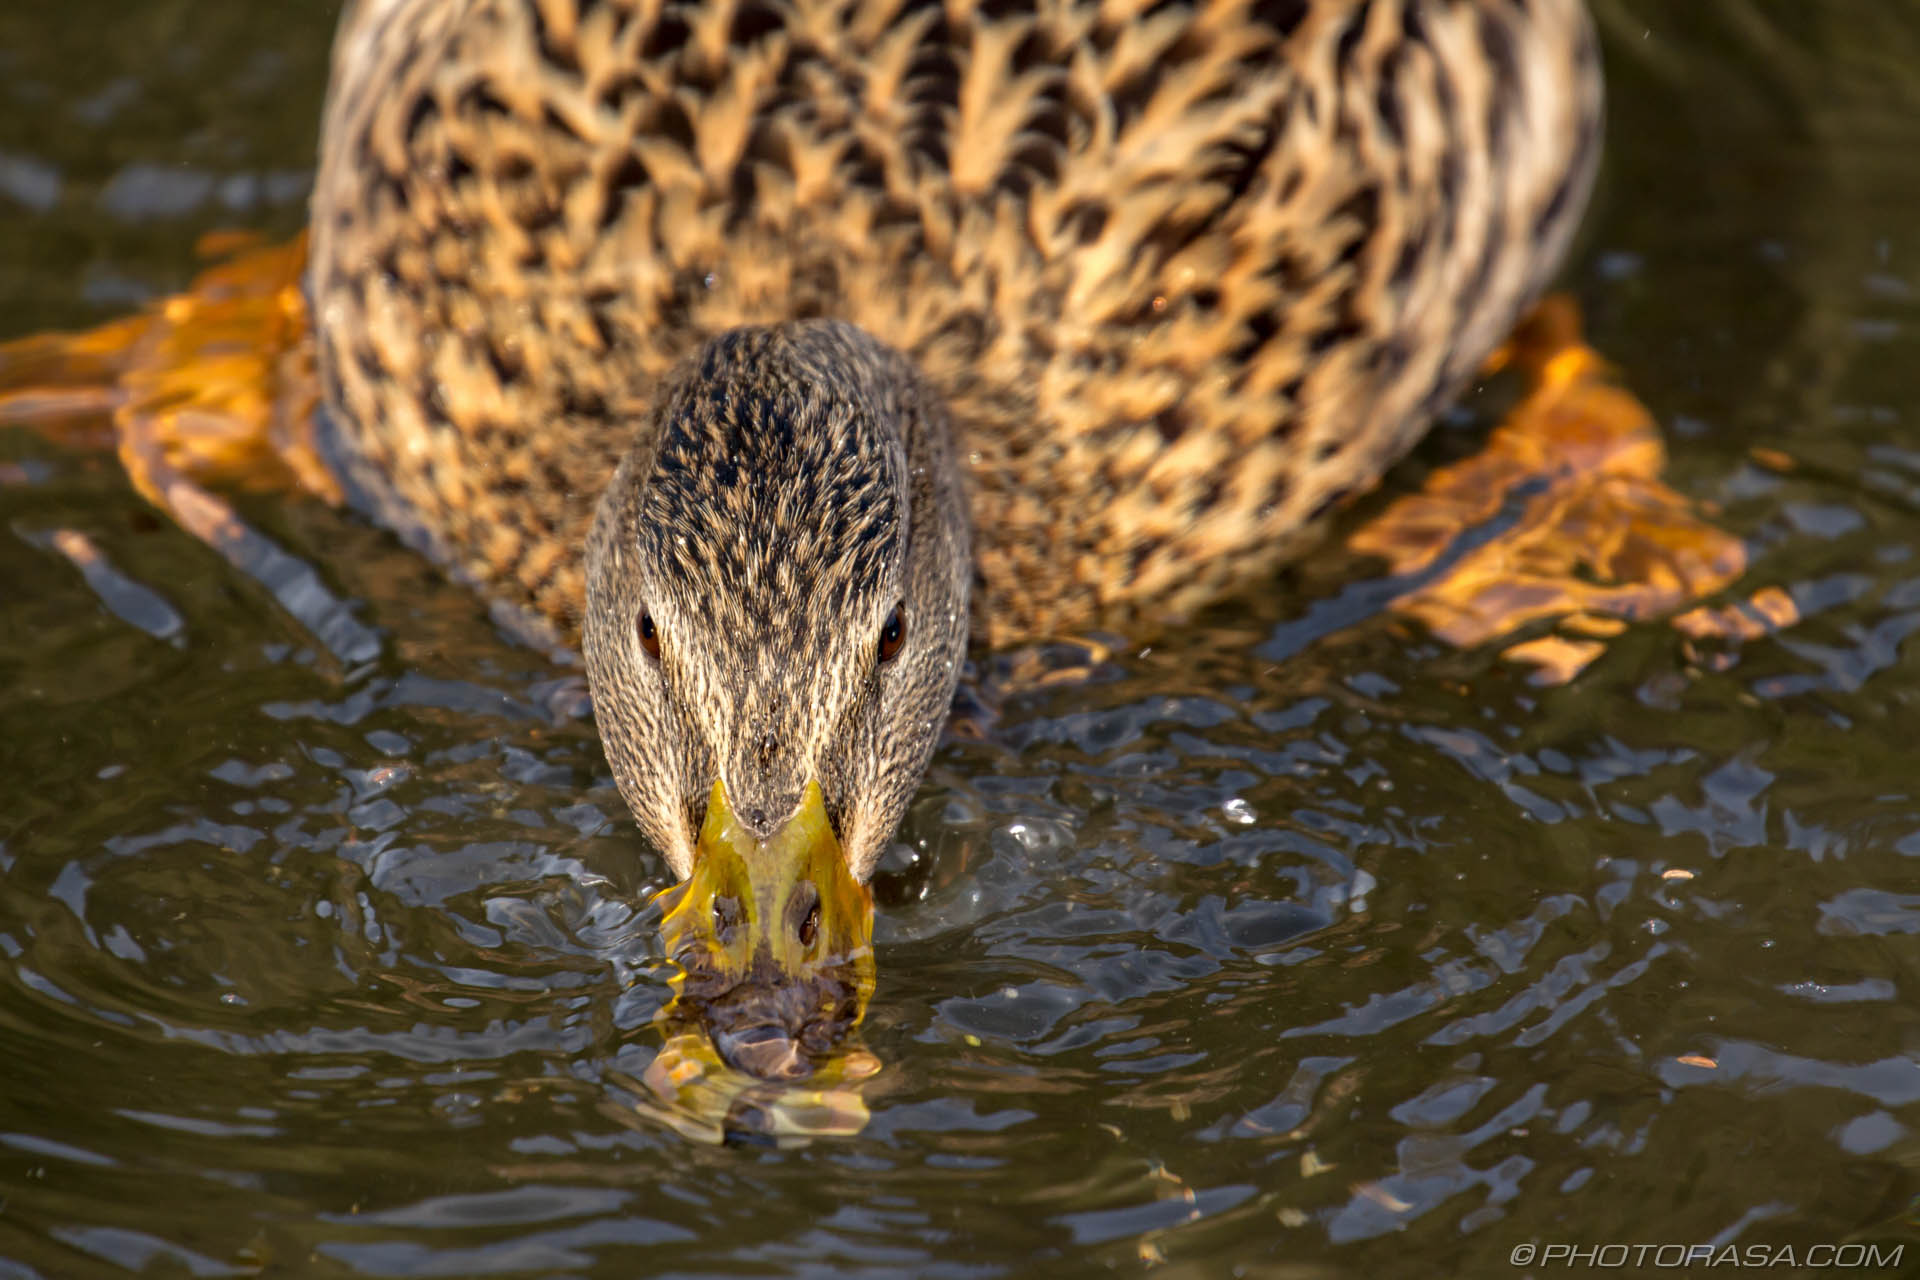 https://photorasa.com/mallard-ducks/female-mallard-collecting-food-from-water-with-bill/